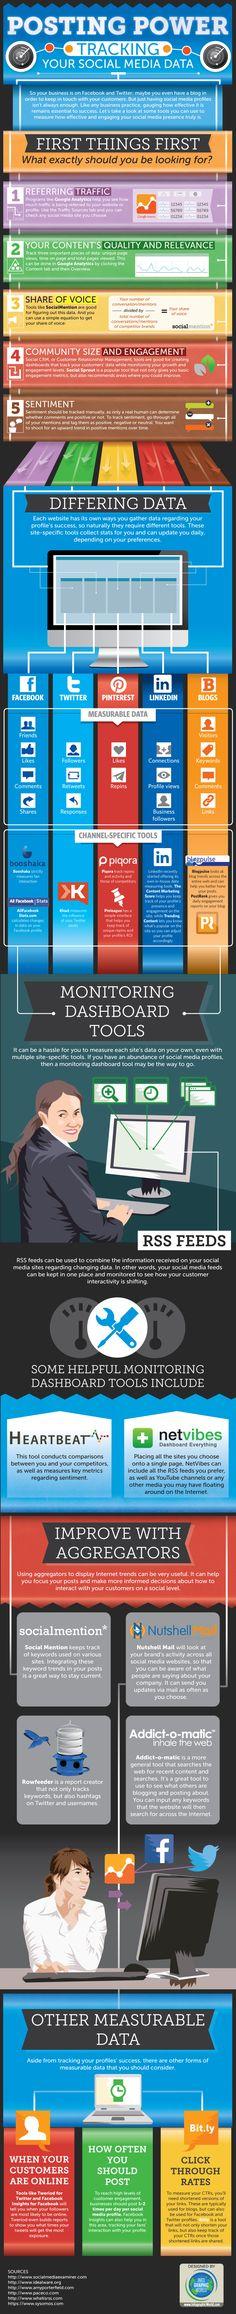 Posting Power Tracking Your #SocialMedia Data | #Infographic